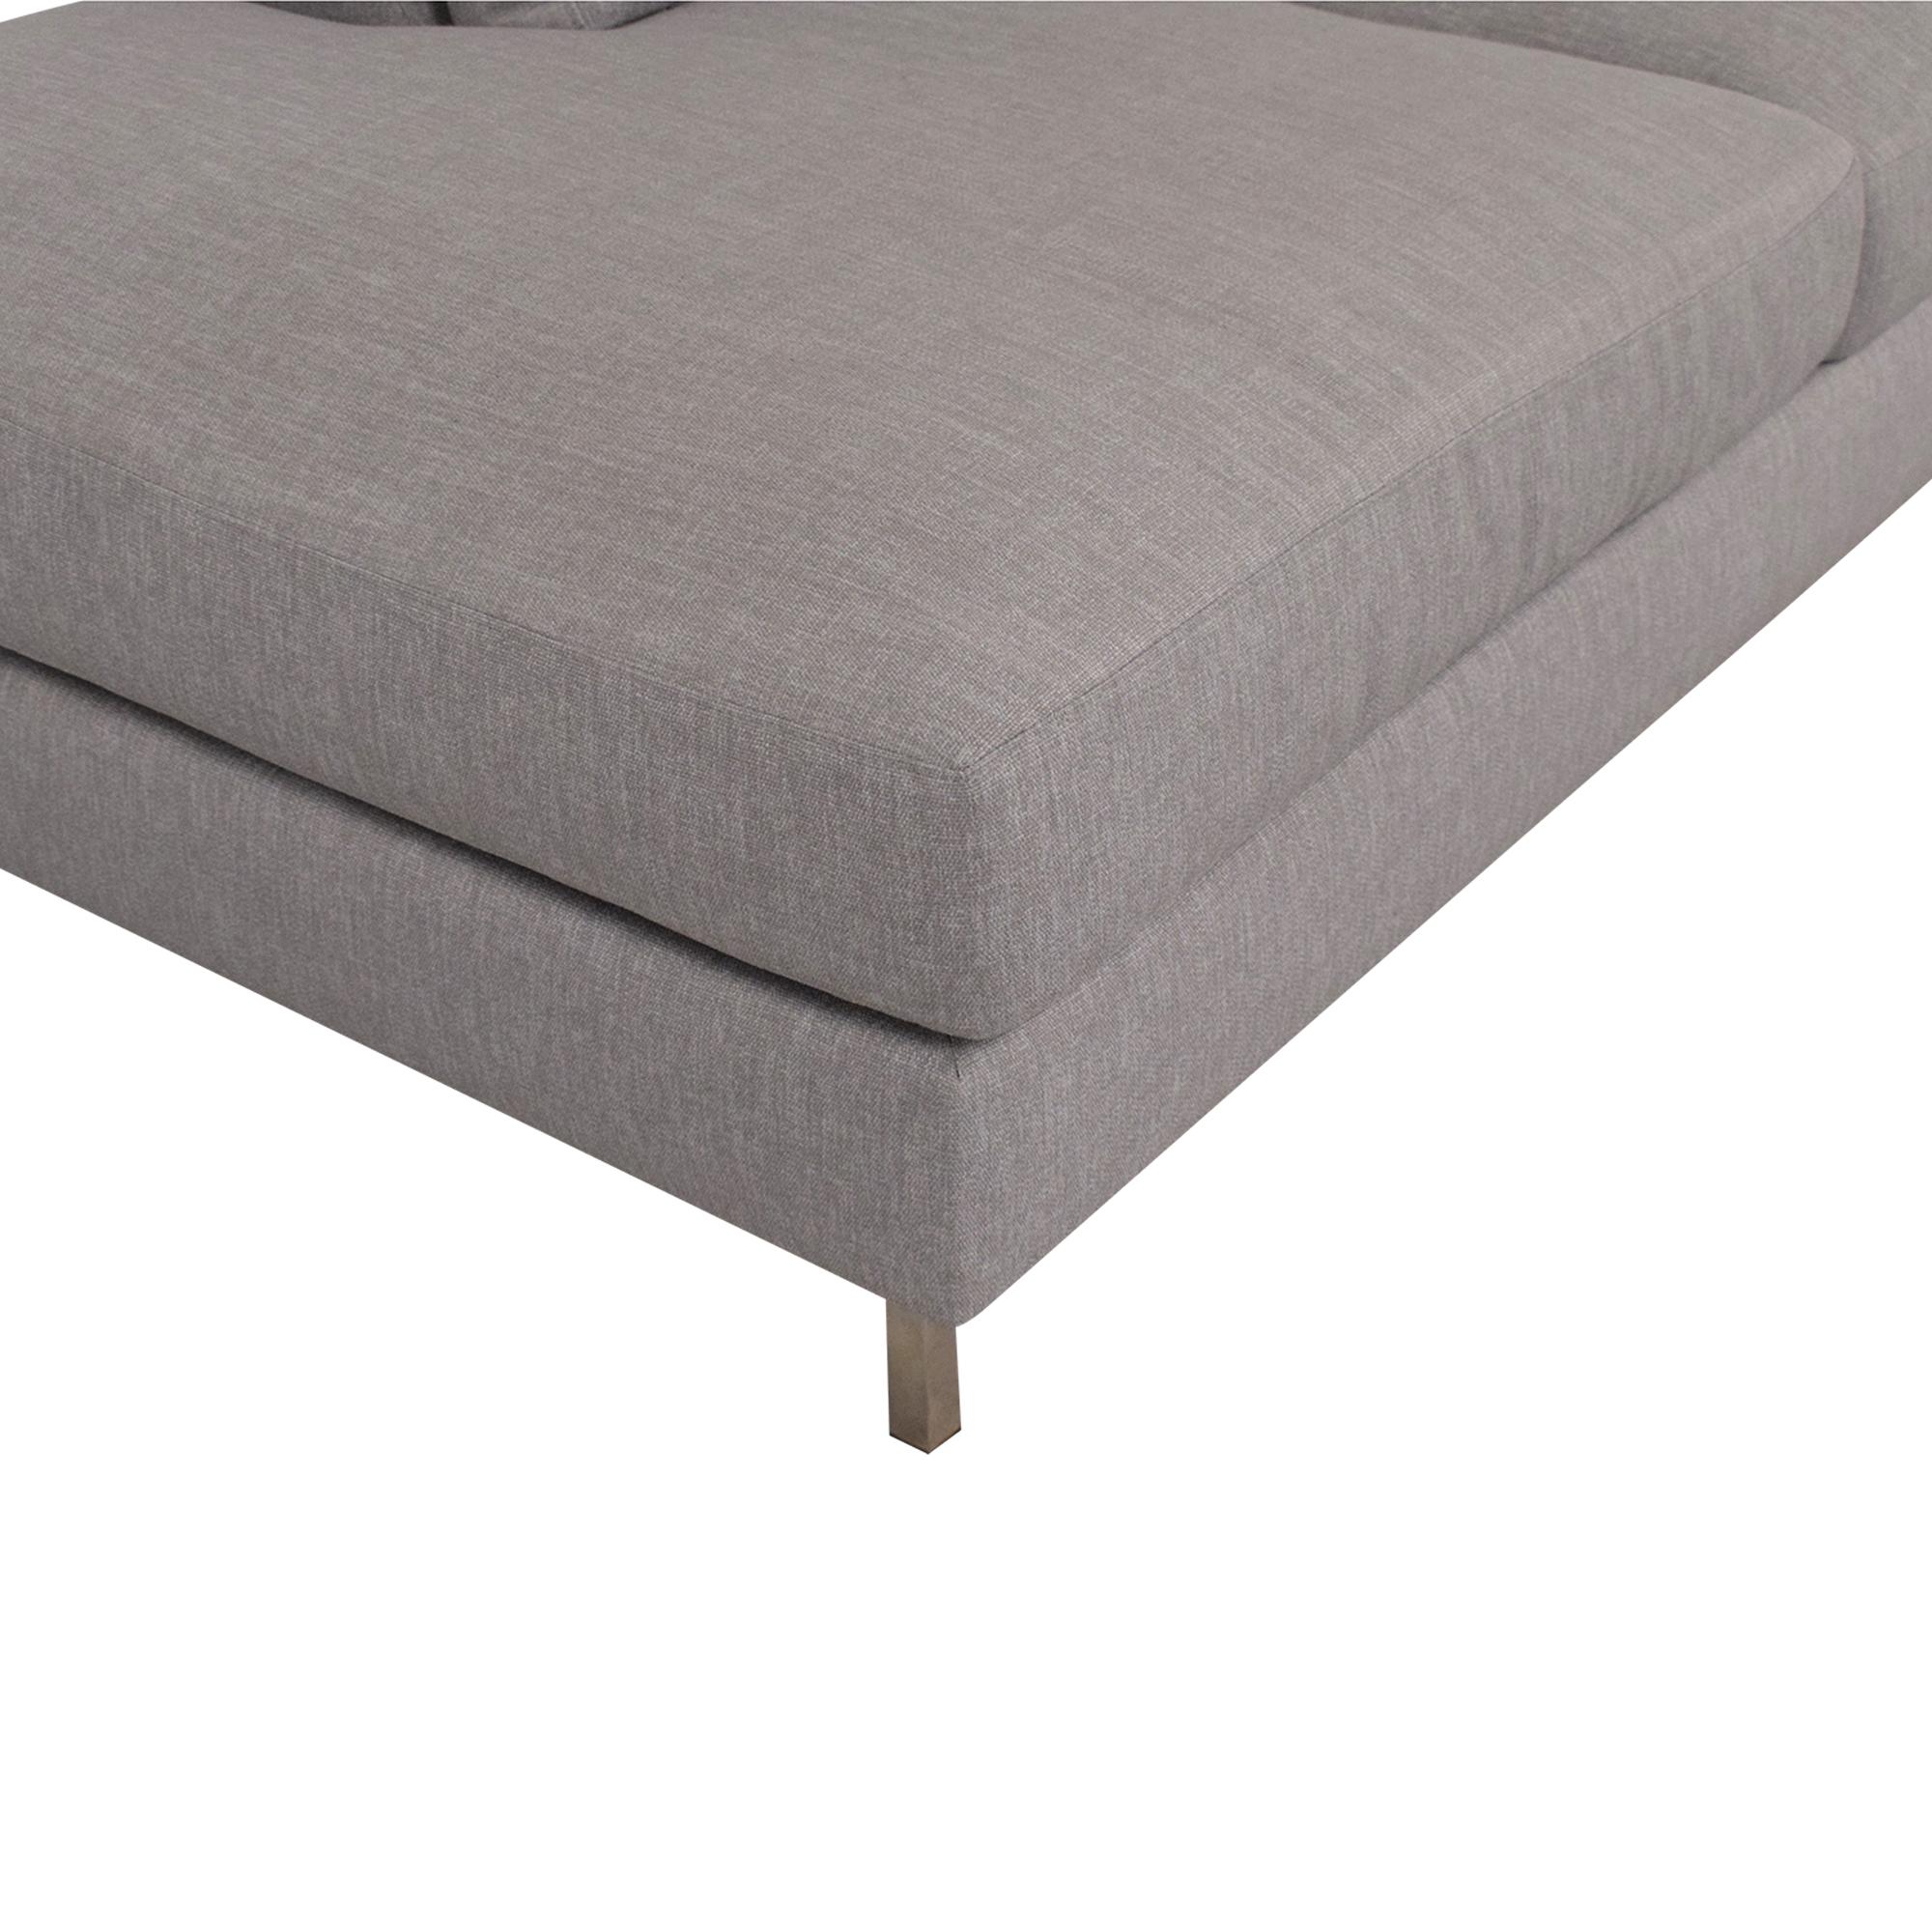 BenchMade Modern BenchMade Modern Skinny Fat Sofa with Bumper nj